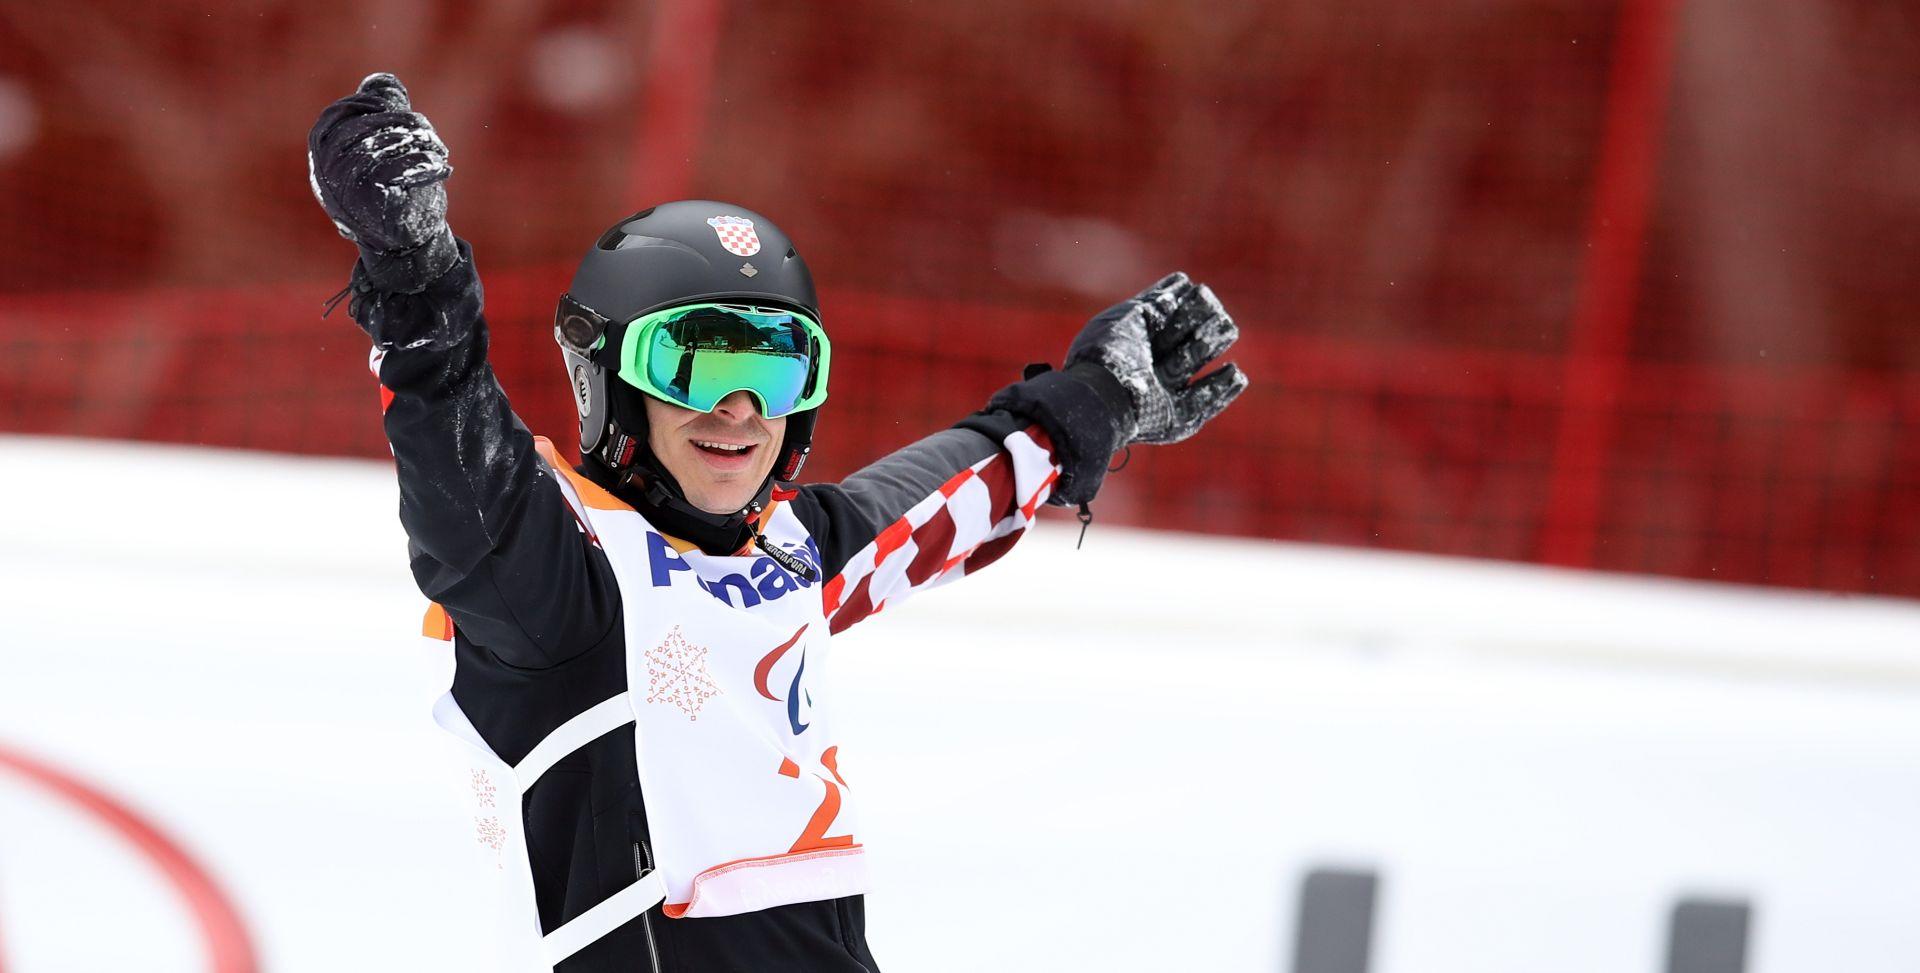 Bruno Bošnjak brončani u snowboardu, prva hrvatska medalja na ZPOI